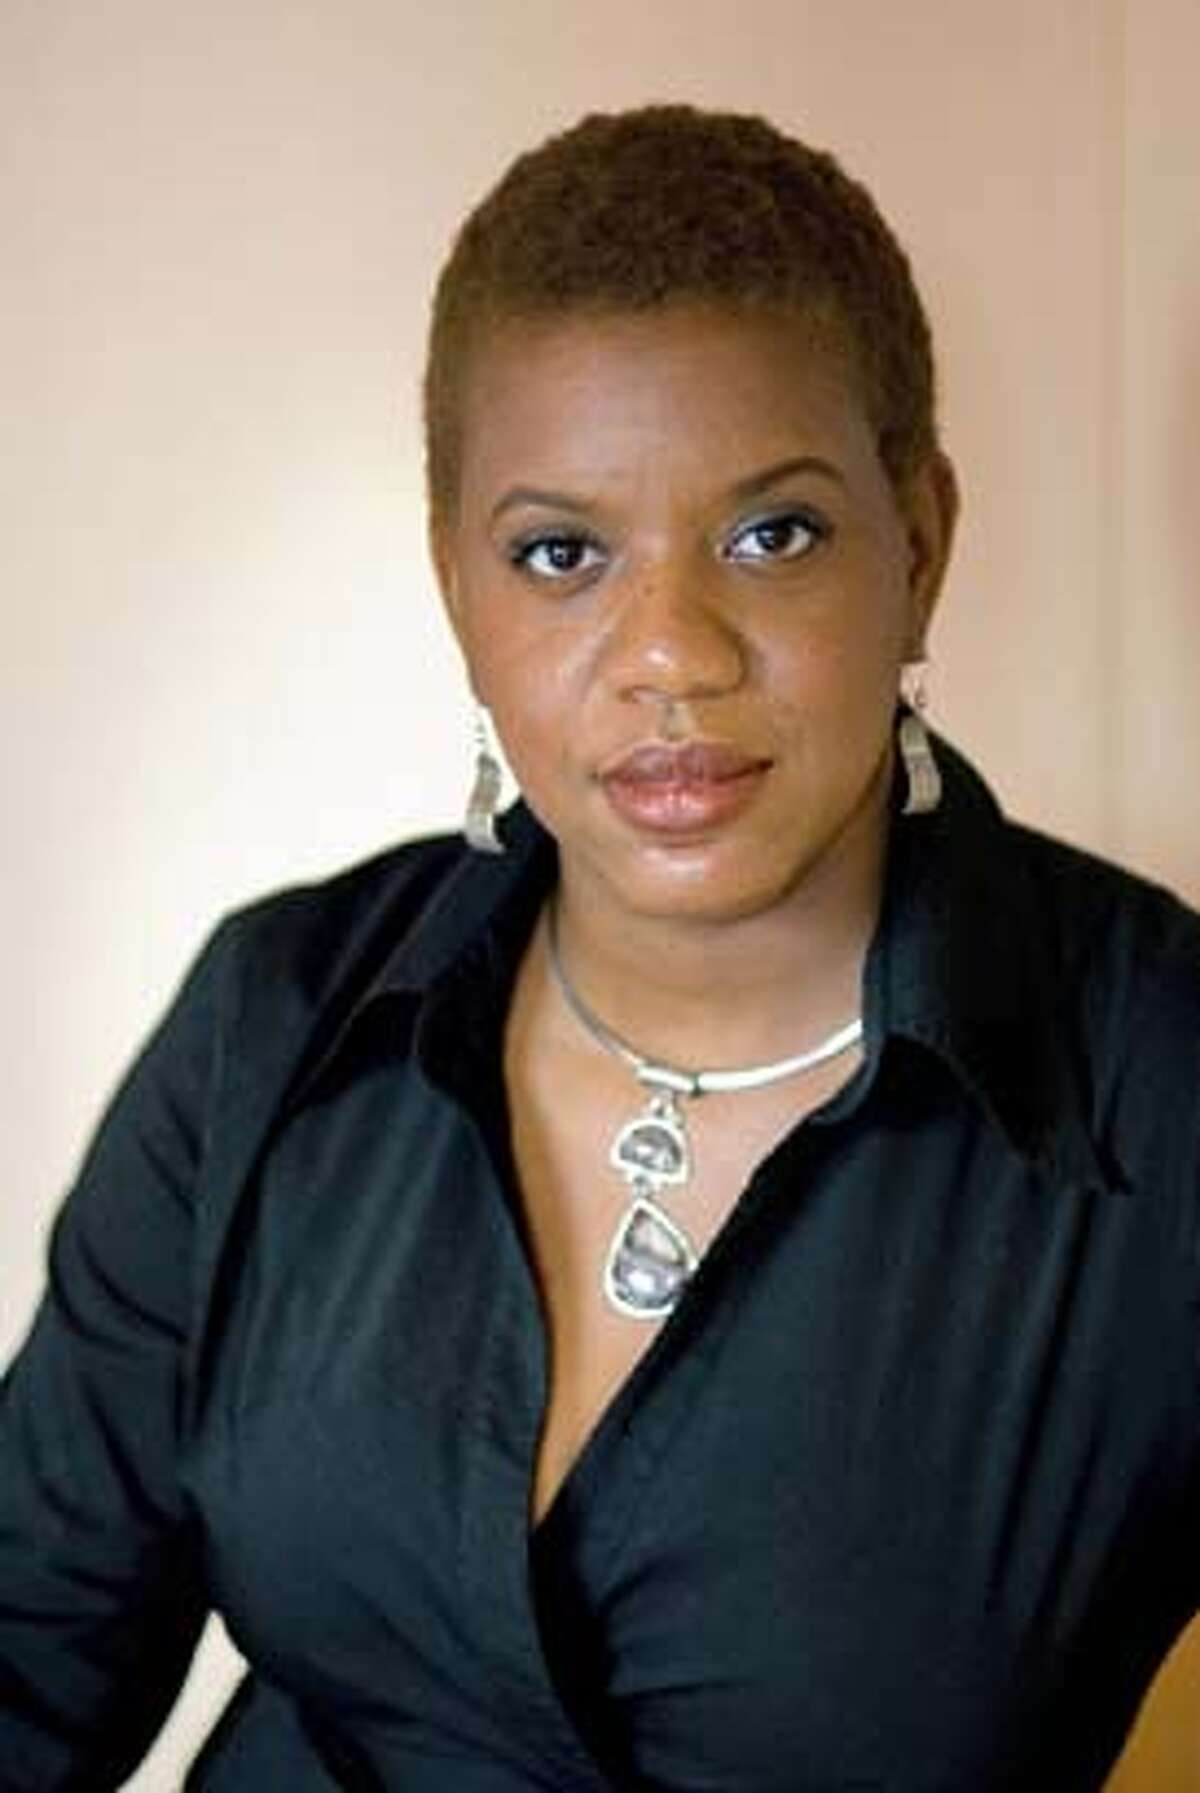 LaShonda Katrice Barnett, author of